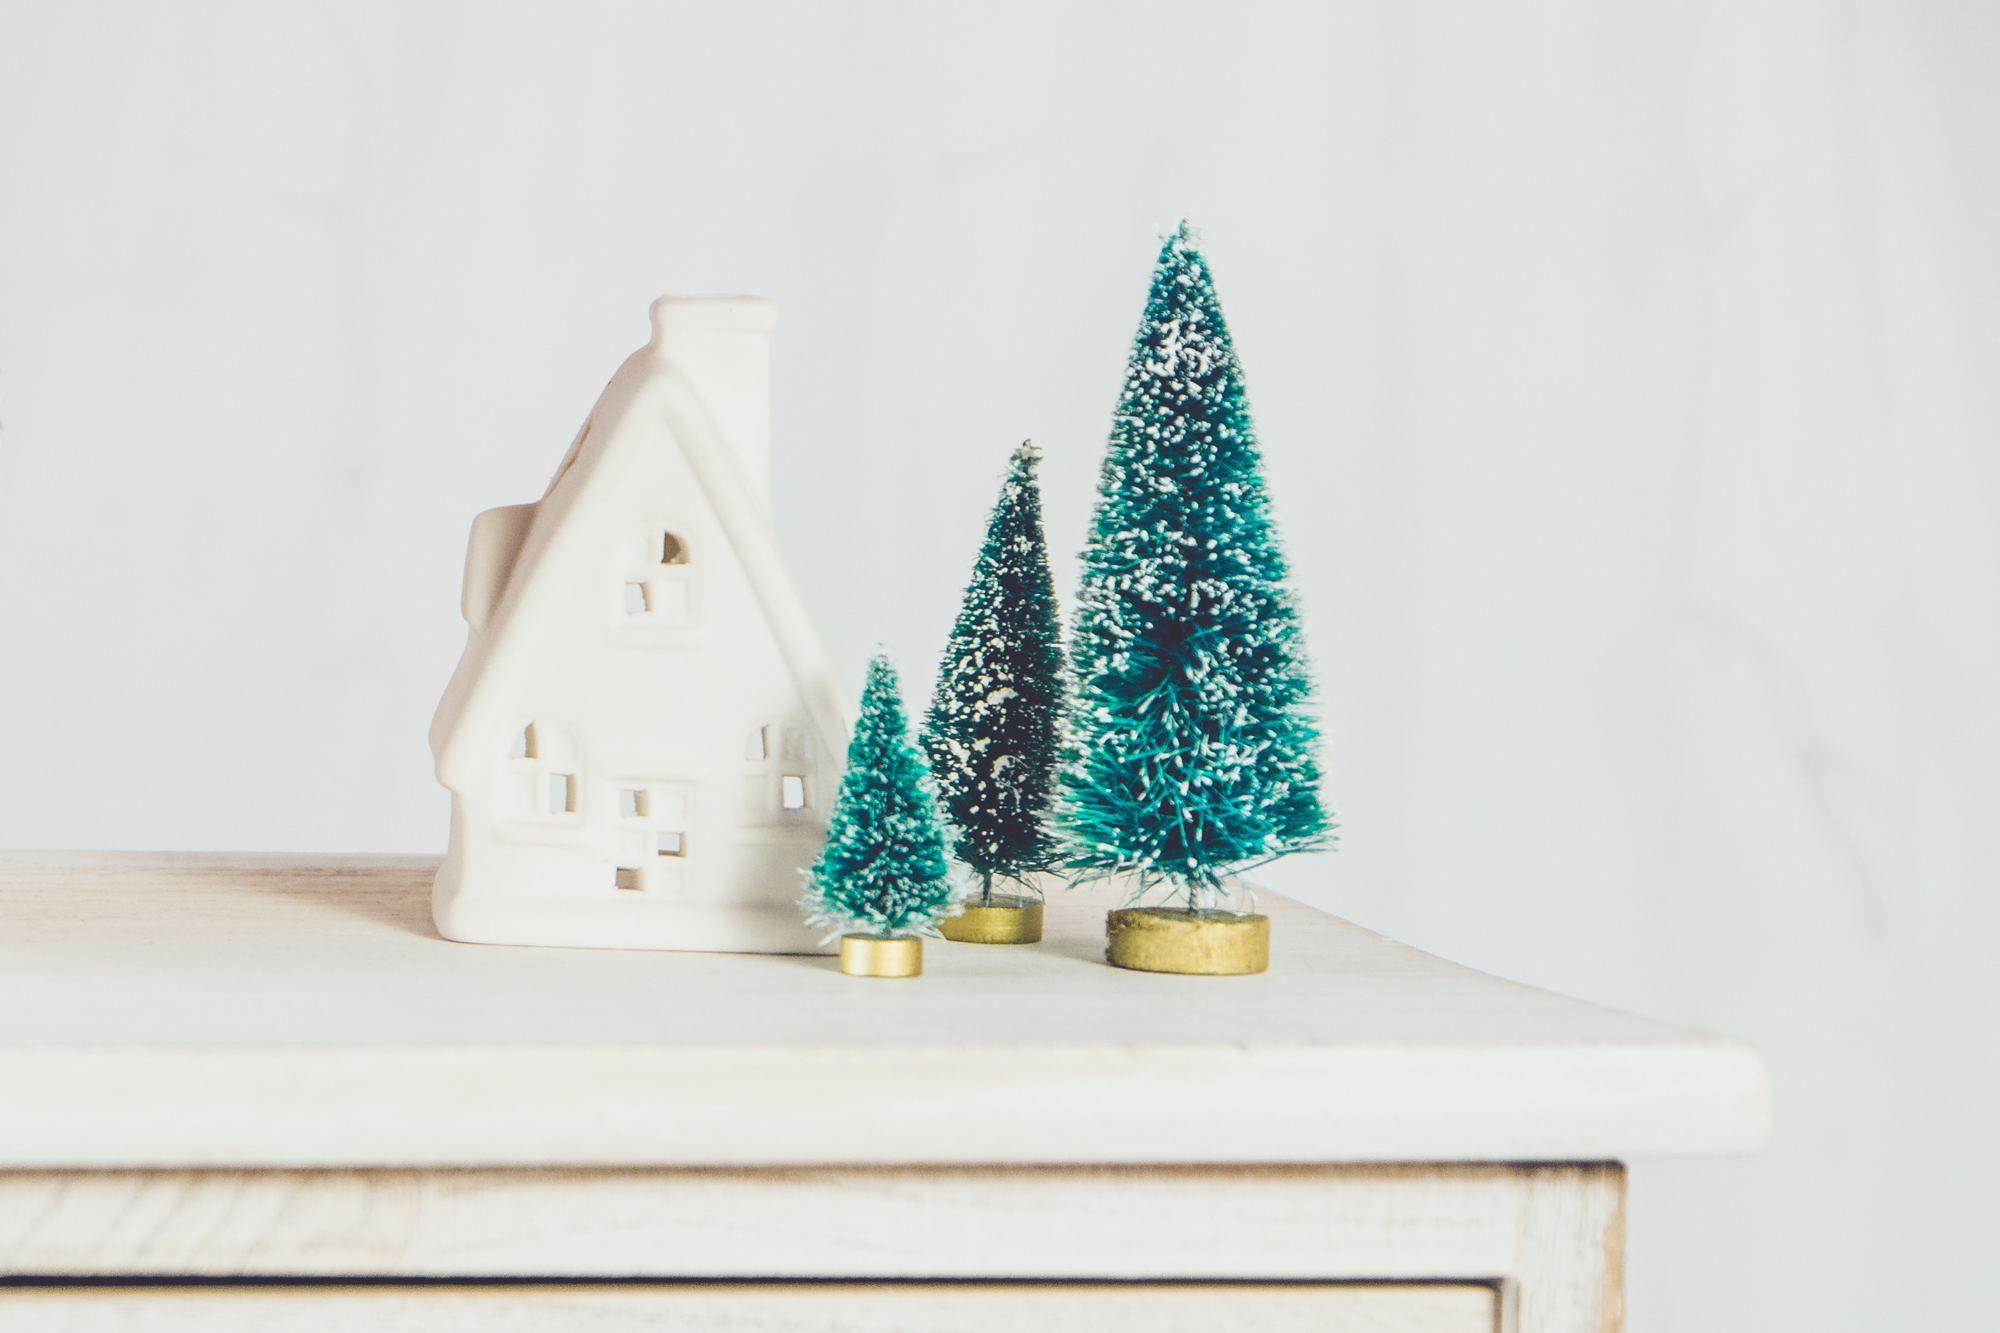 Kerst in huis: zo maak jij jouw woning in no time kerstproof